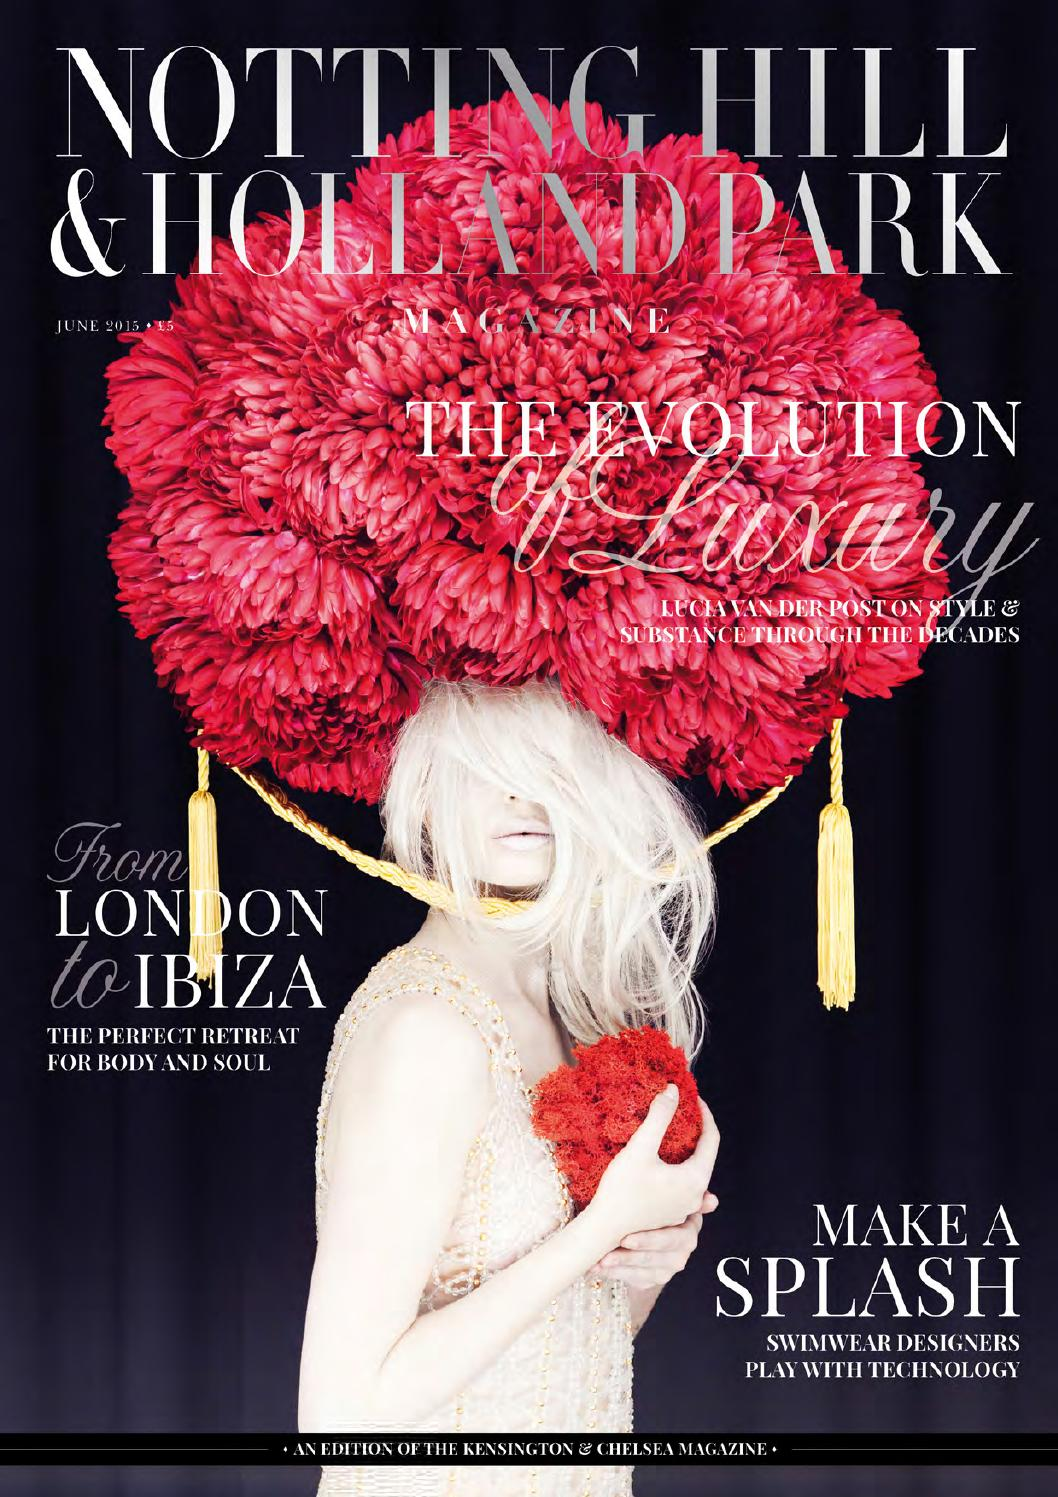 921aaa6ddee61 The Notting Hill & Holland Park Magazine June 2015 by Runwild Media ...